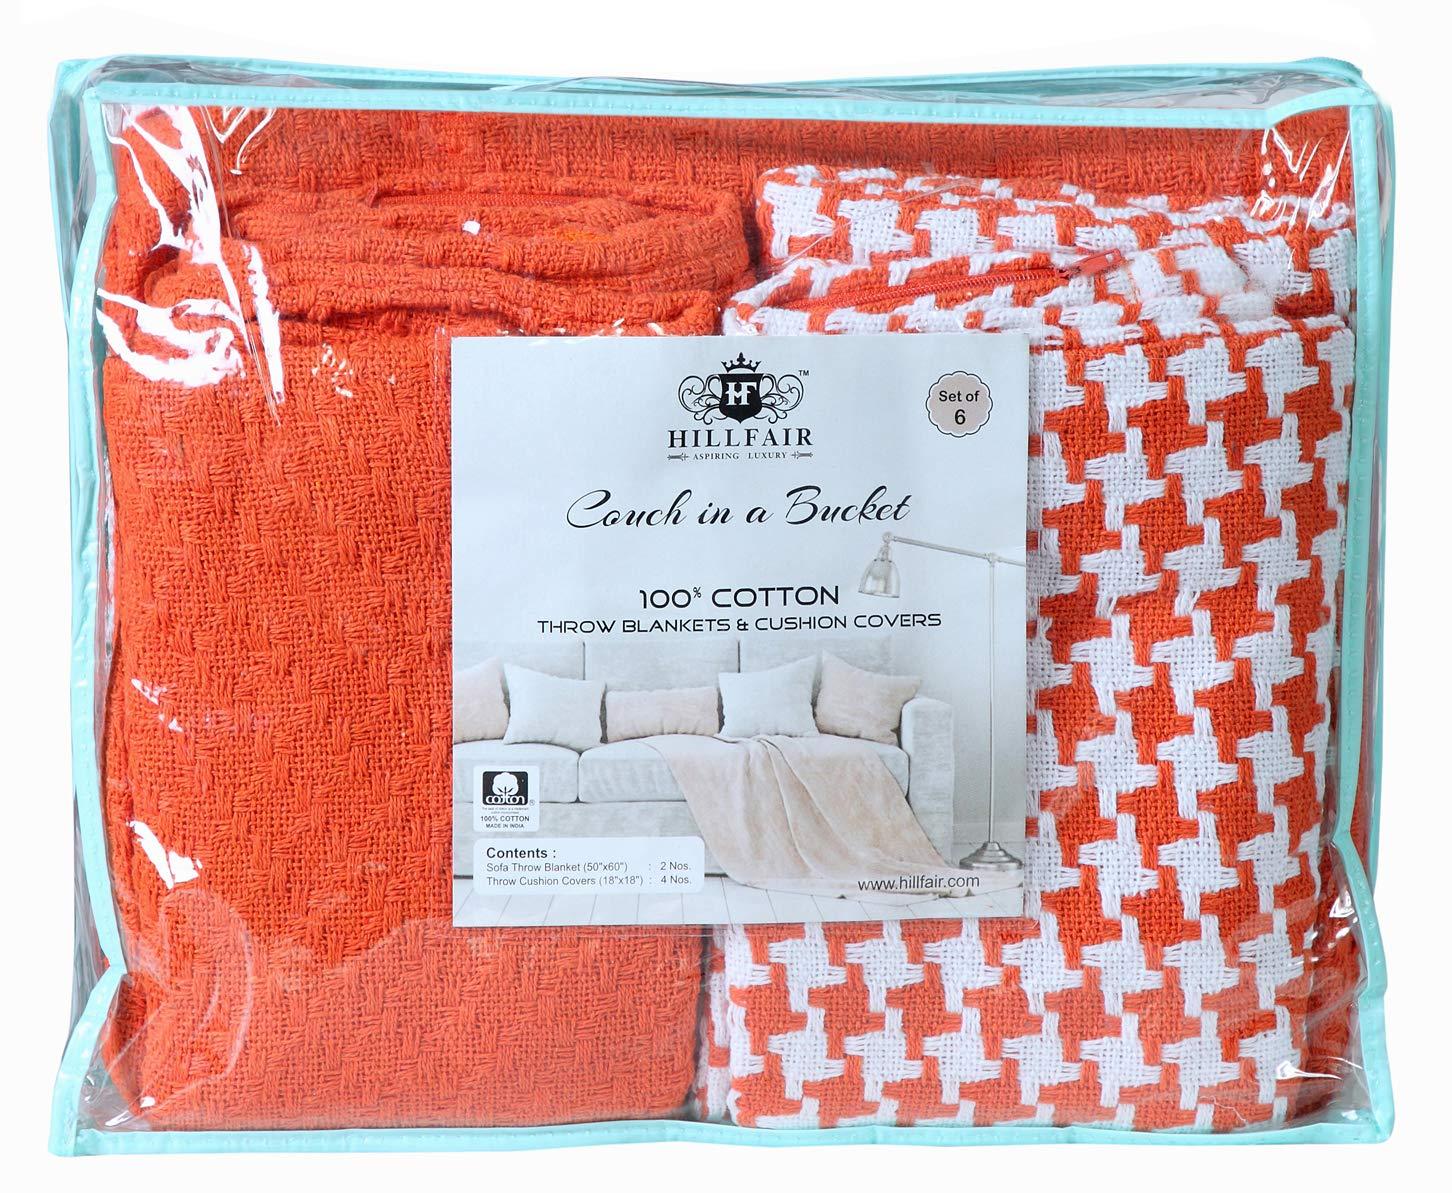 Kess InHouse Oriana Cordero Athena-Flower Pink Lavender Throw 60 x 40 Fleece Blankets